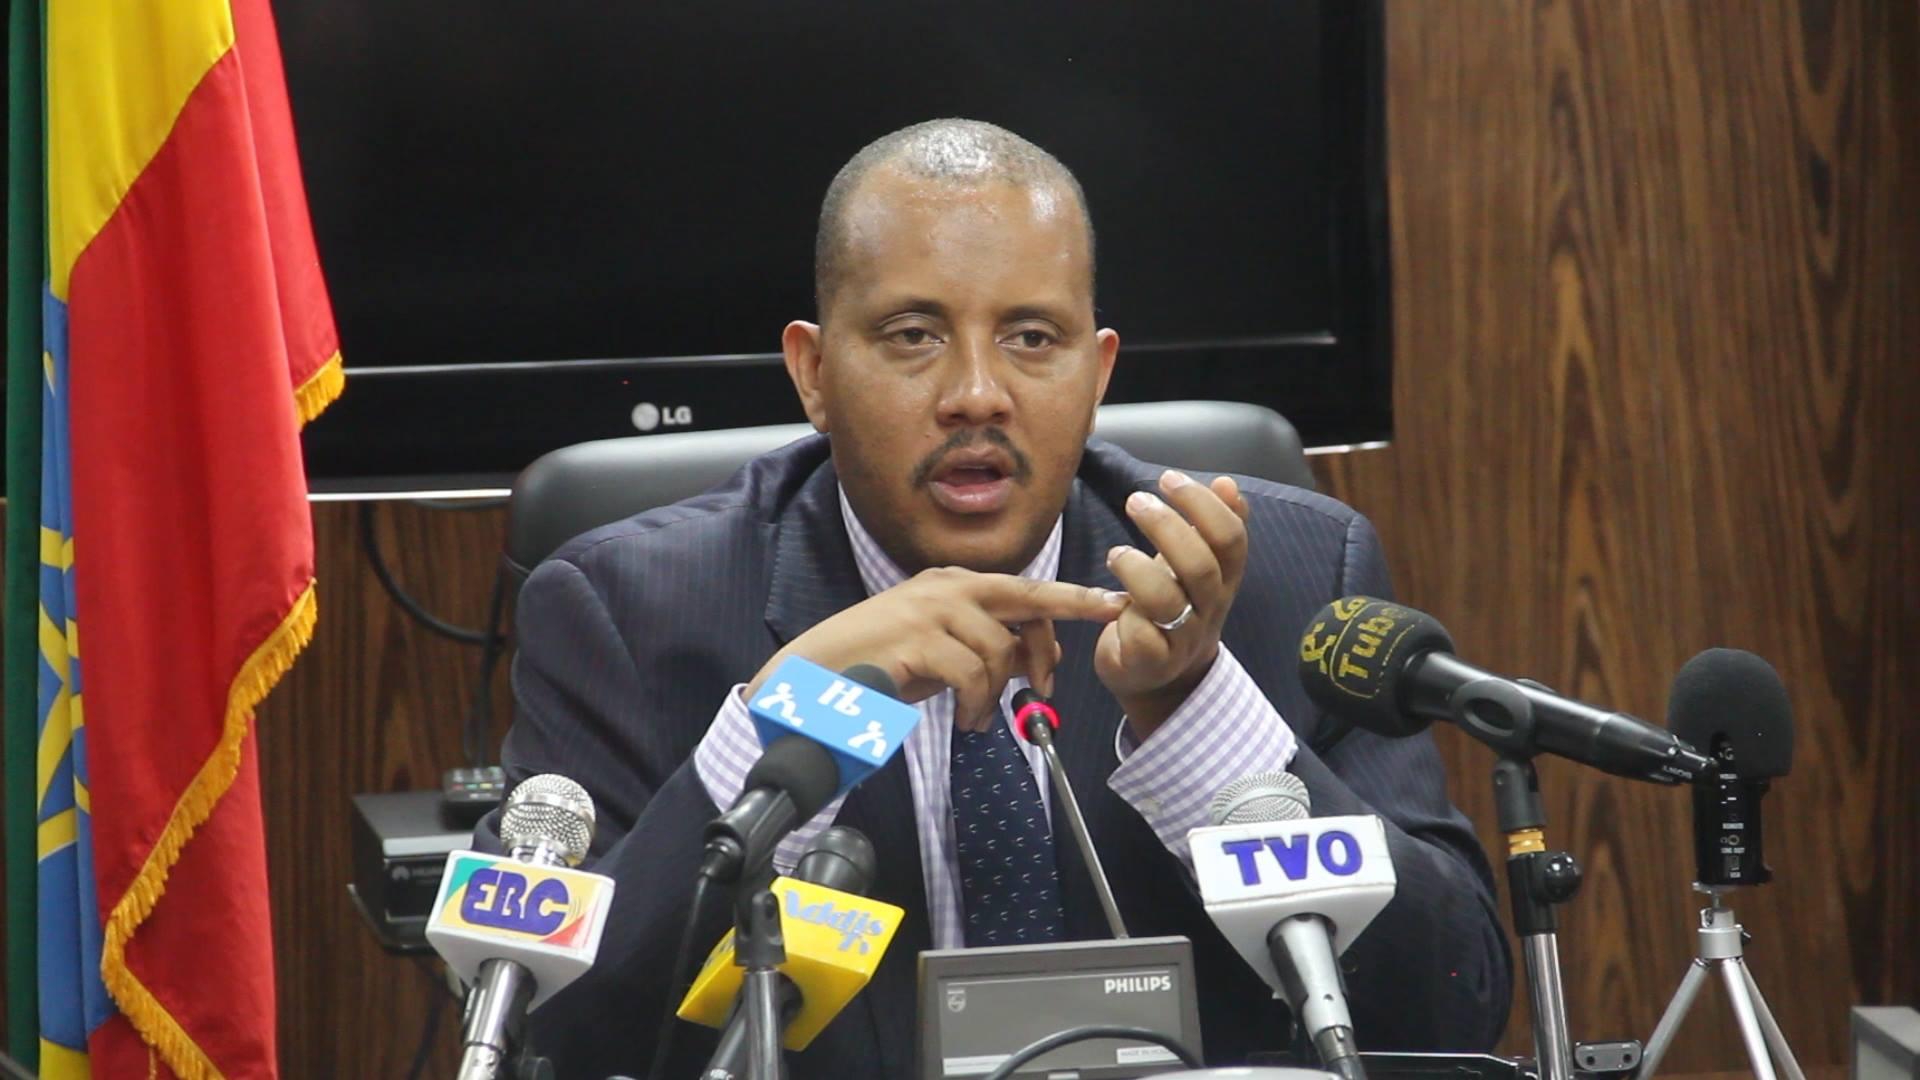 Getachew Reda: Ethiopia has the capacity to wage a full scale war against Eritrea